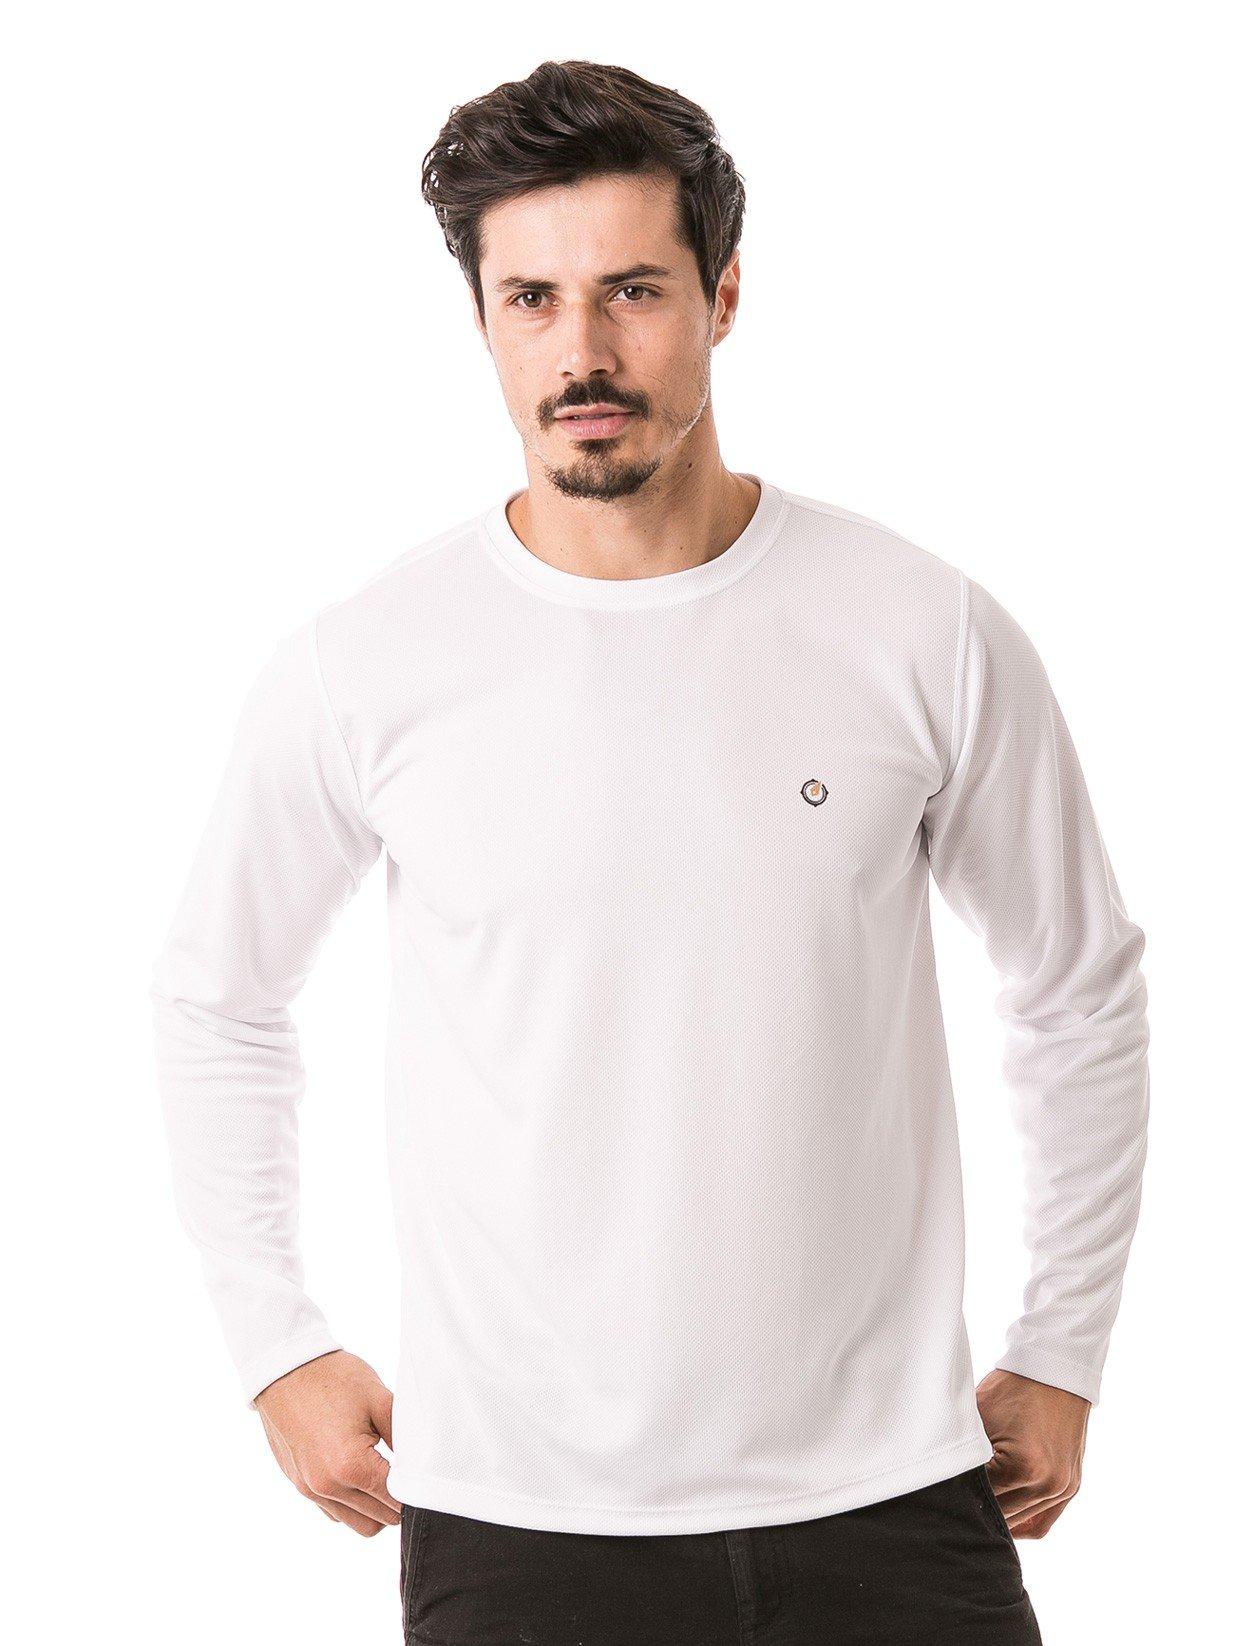 masculina t shirt longa dry branca frente b